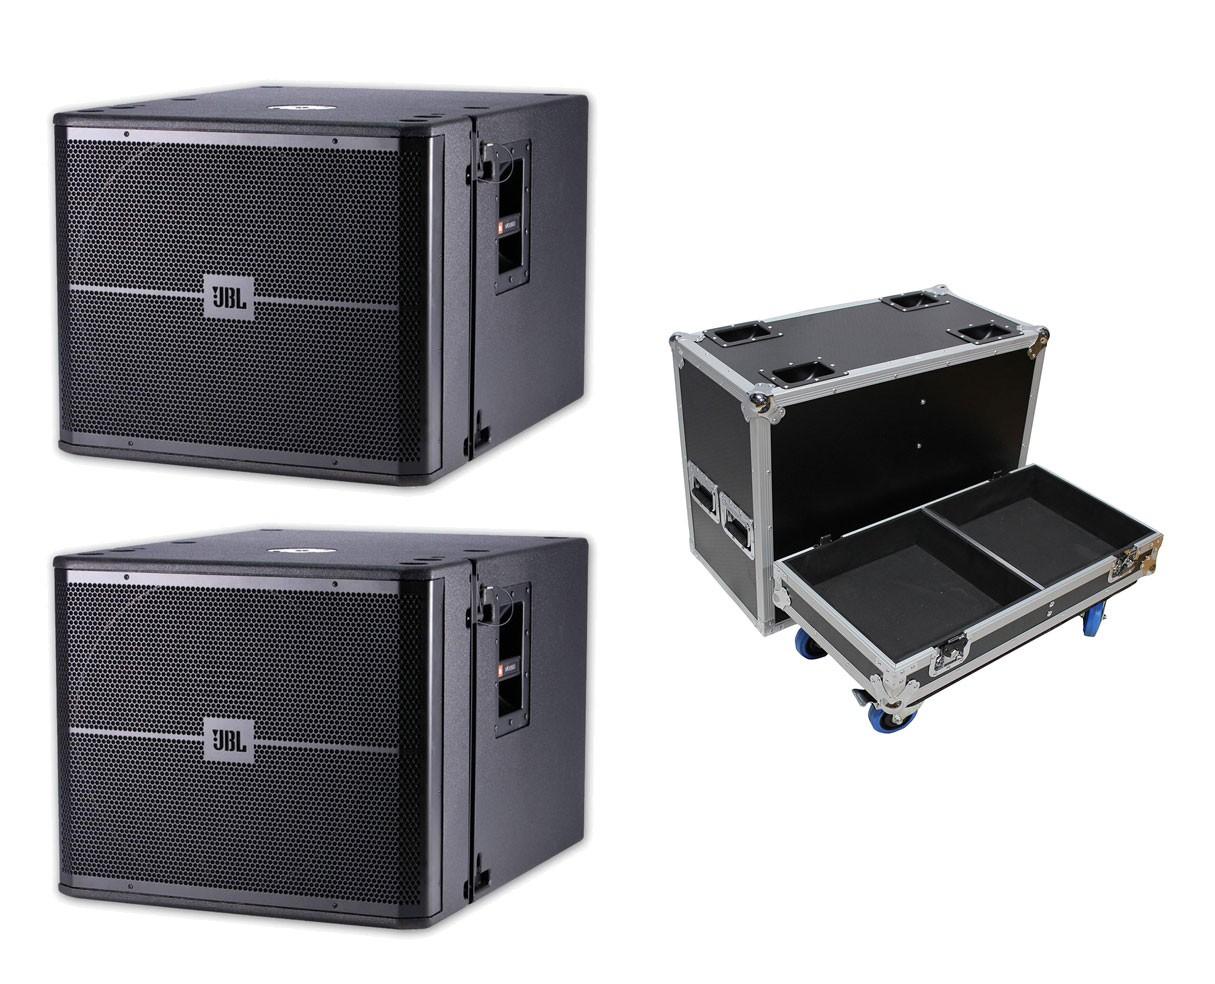 2x JBL VRX918SP + ATA Case